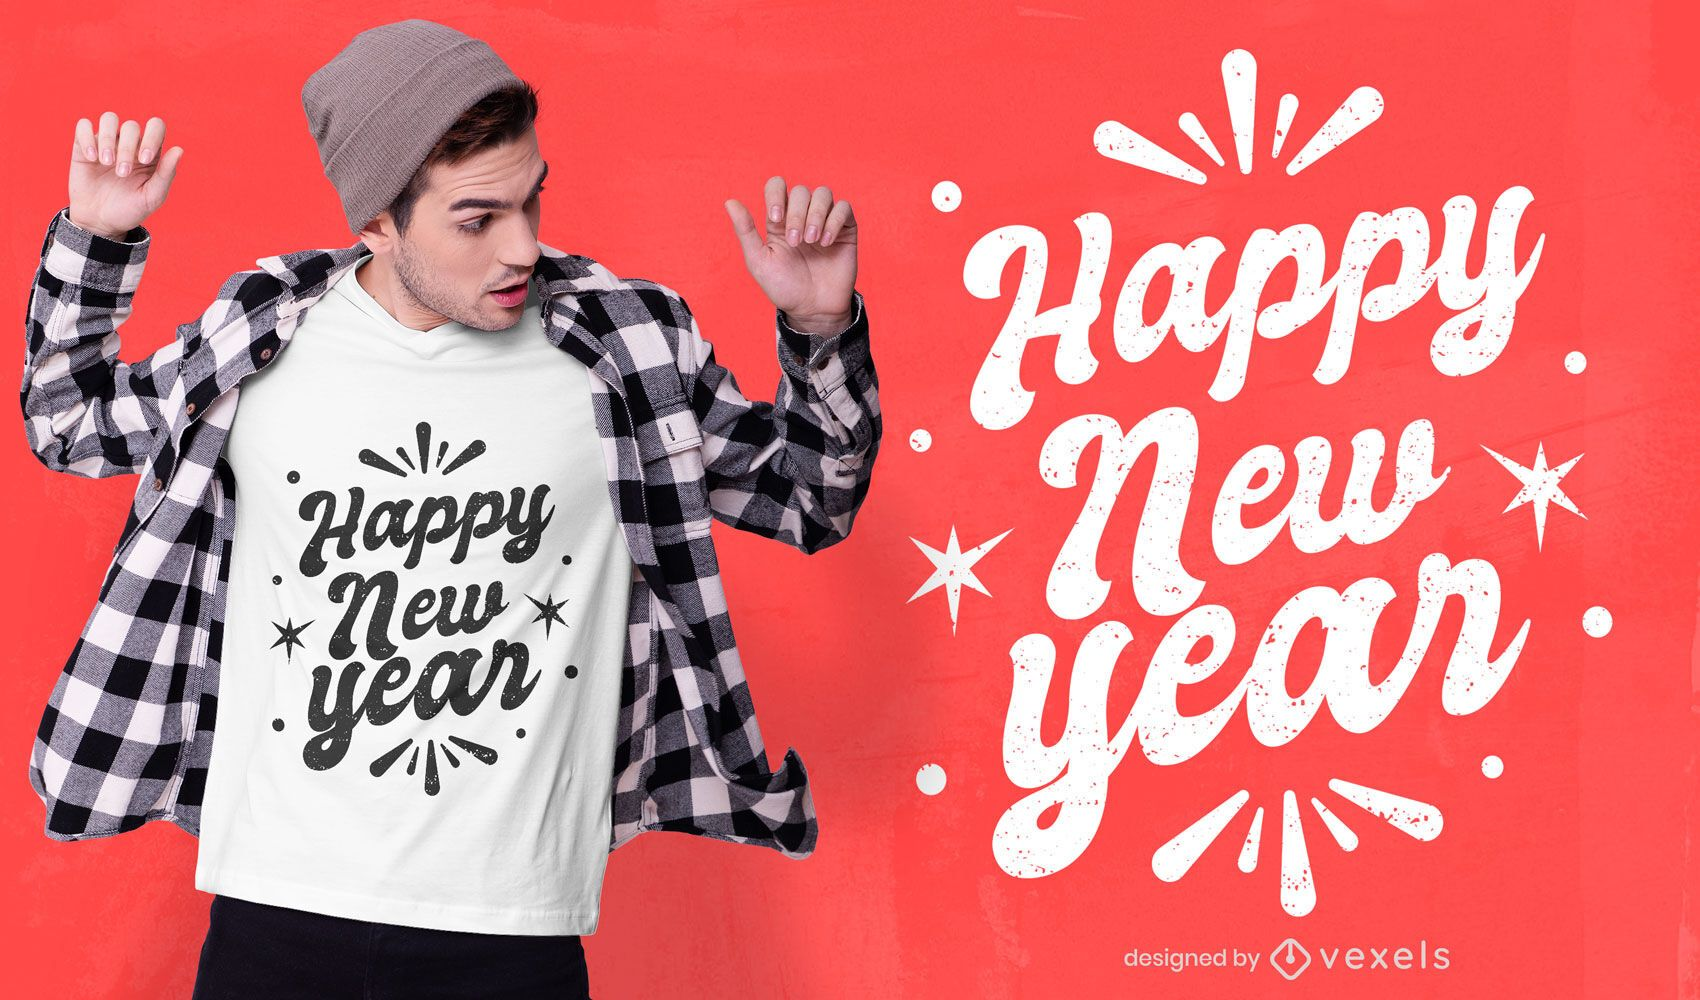 Happy new year t-shirt design